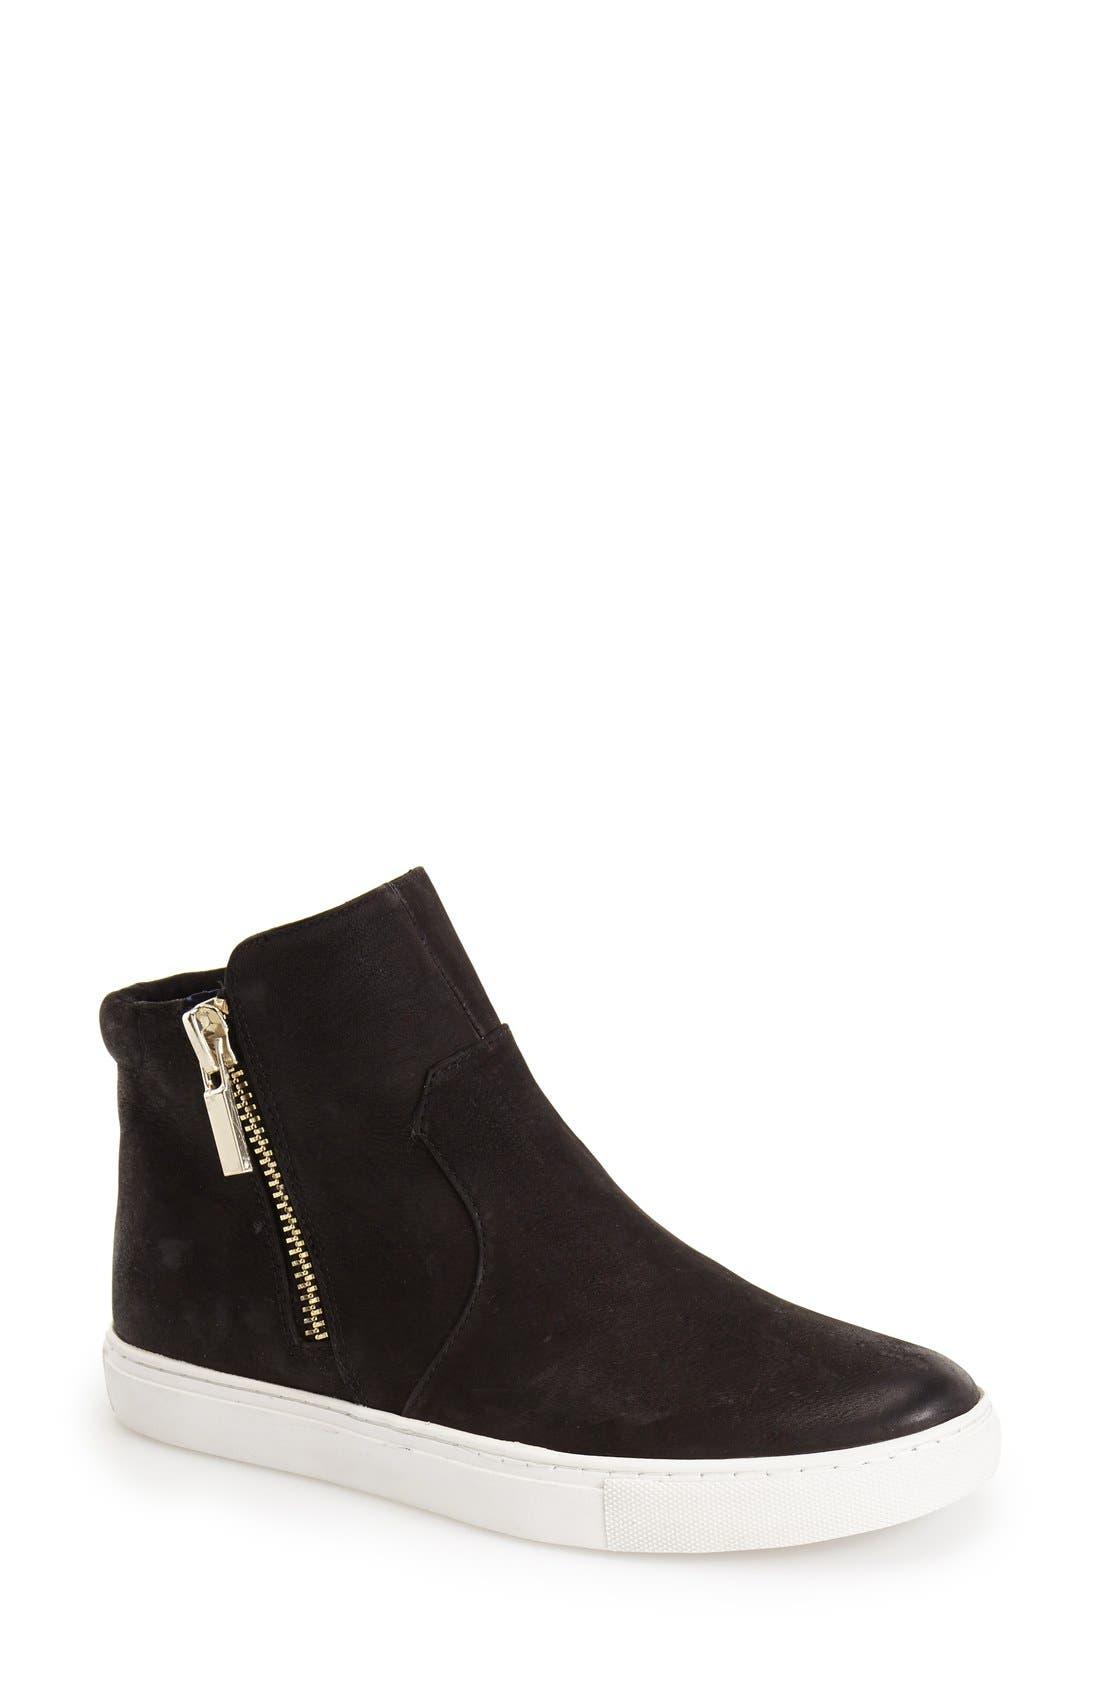 'Kiera' Zip High Top Sneaker,                         Main,                         color, BLACK LEATHER